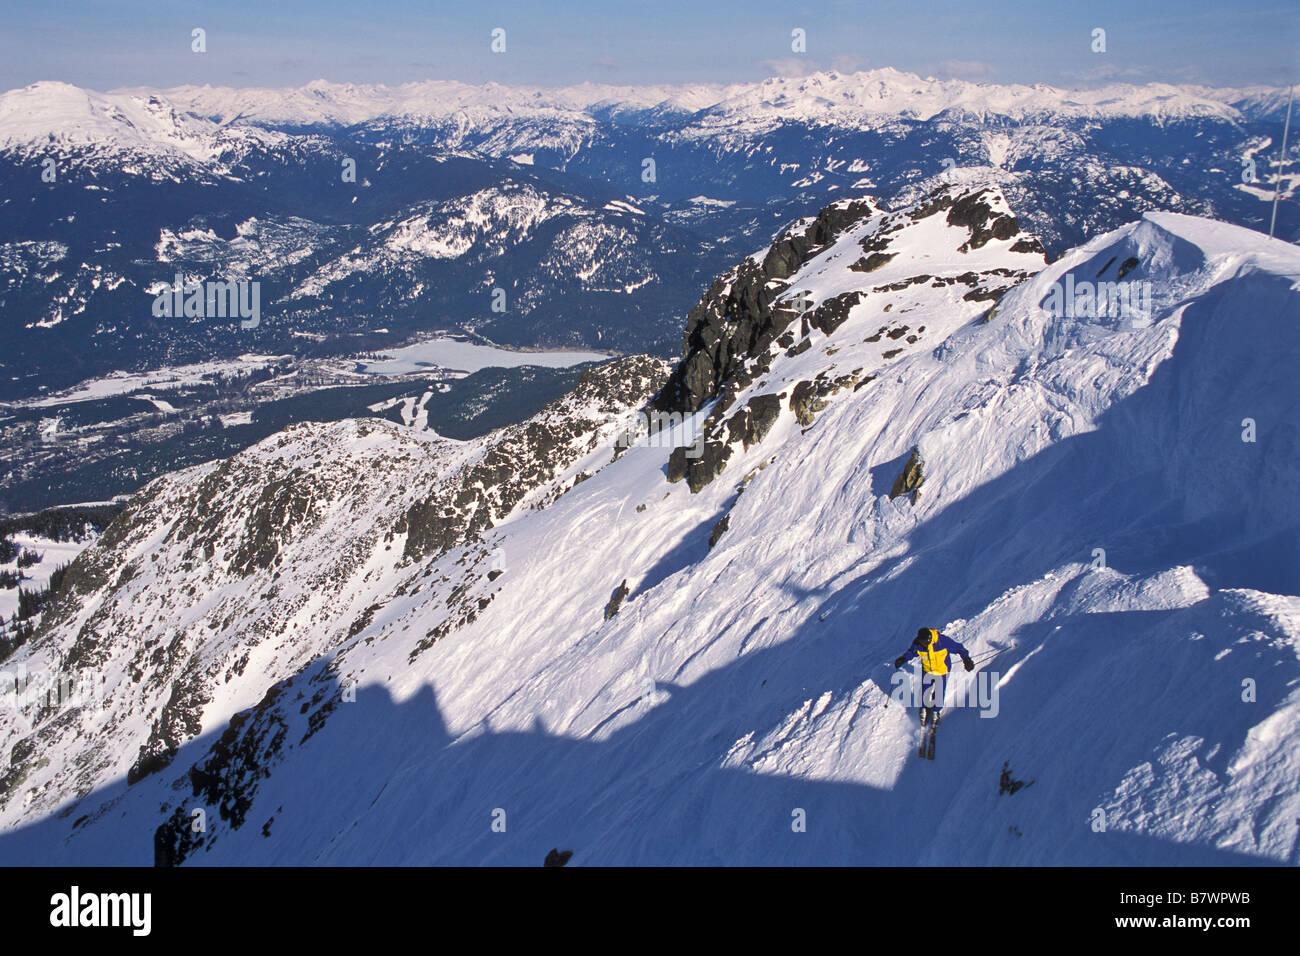 A skier makes an off-piste run at Blackcomb, Whistler Blackcomb Resort, British Columbia. - Stock Image